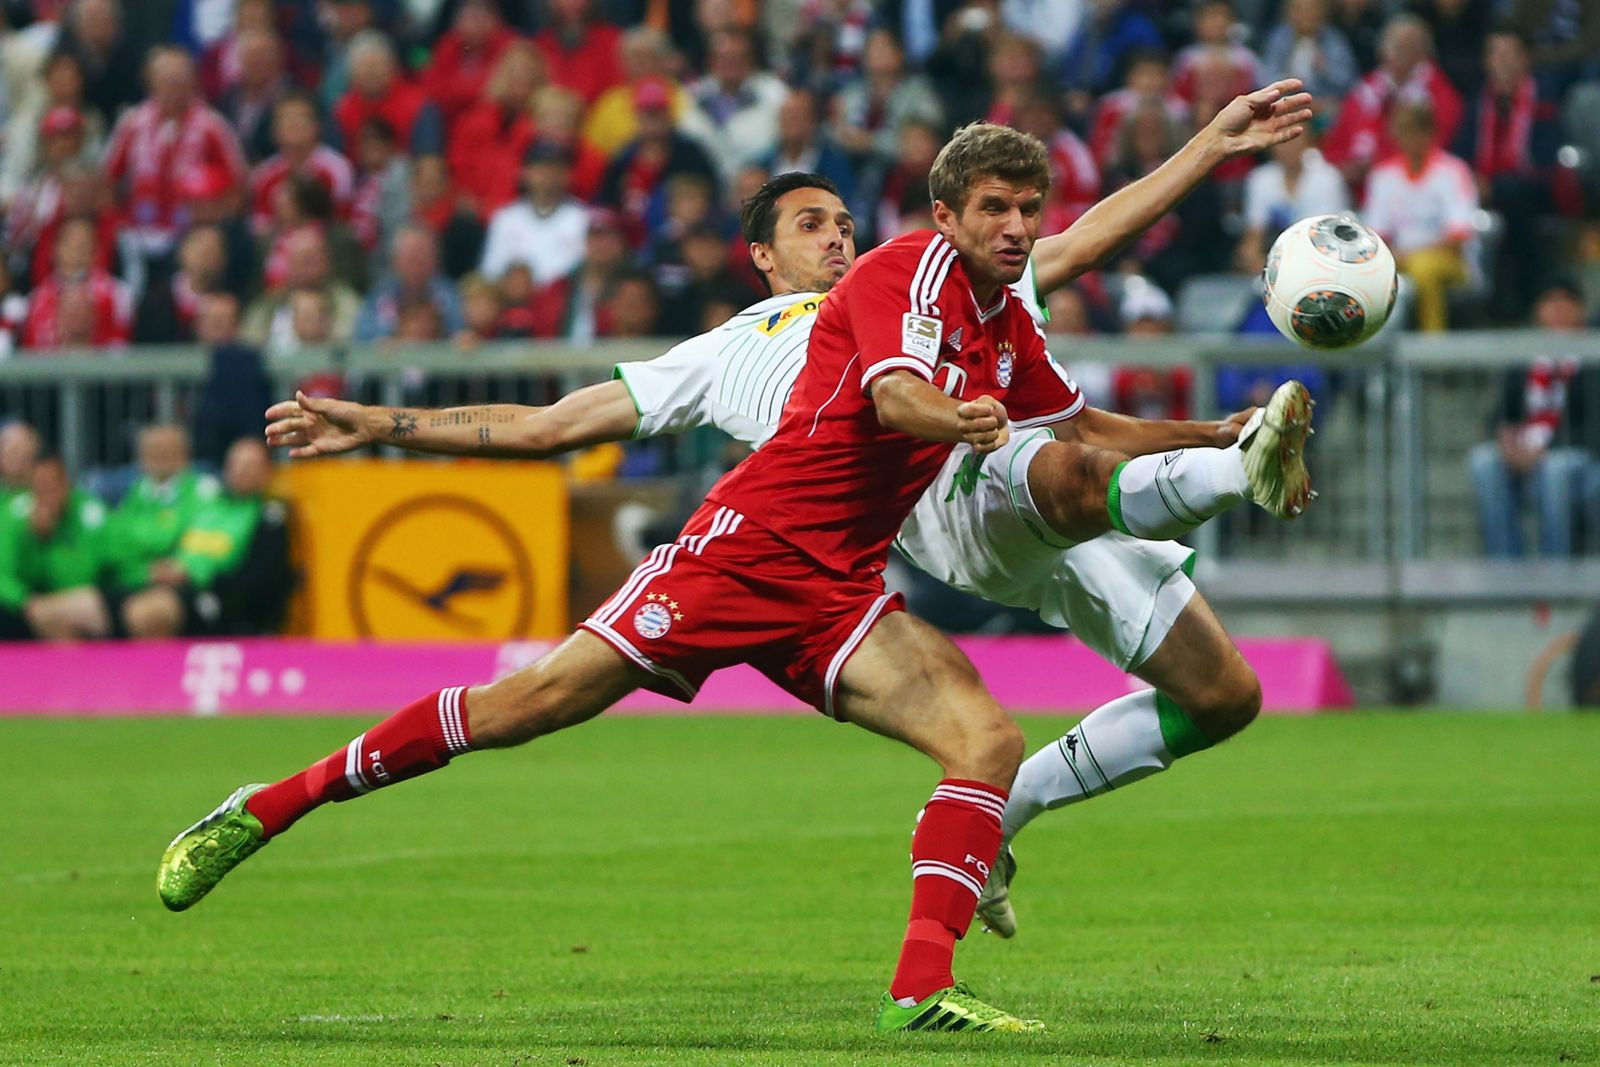 Bayern vs Mönchengladbach / Thomas Müller vs Martin Stranzl